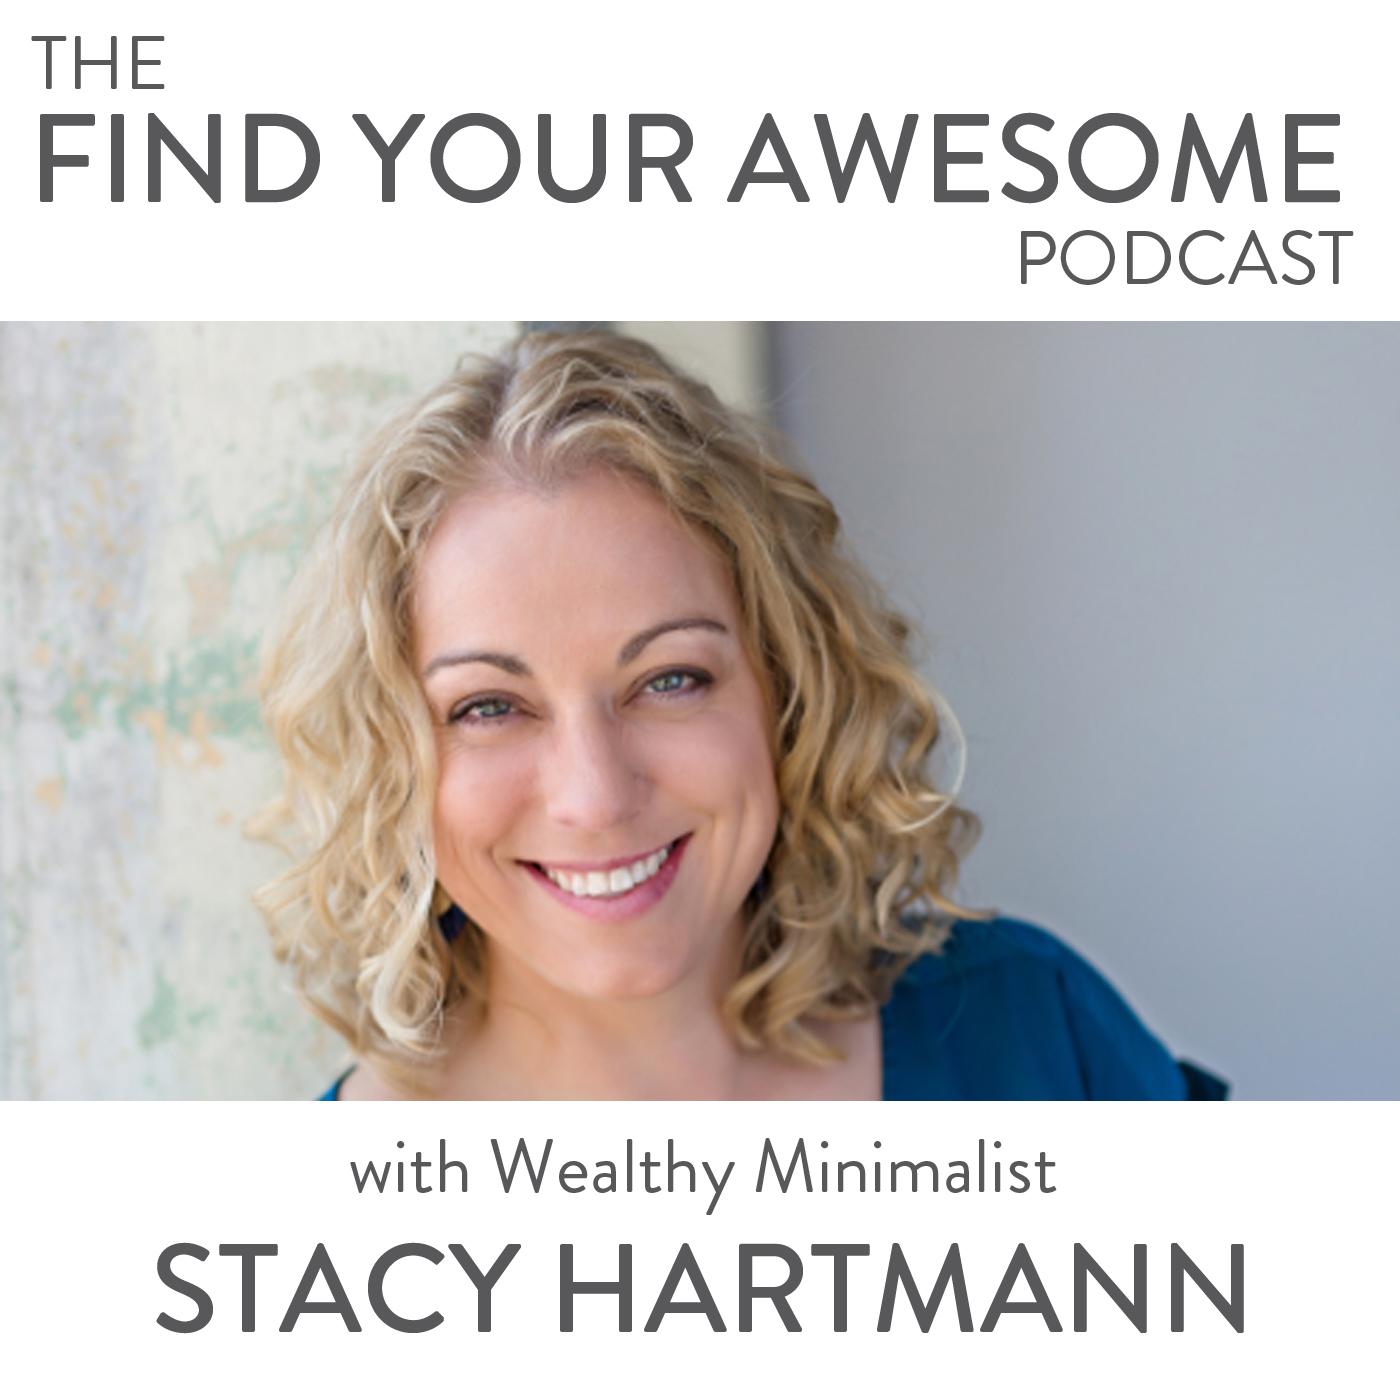 StacyHartmann_podcast_coverart.jpg